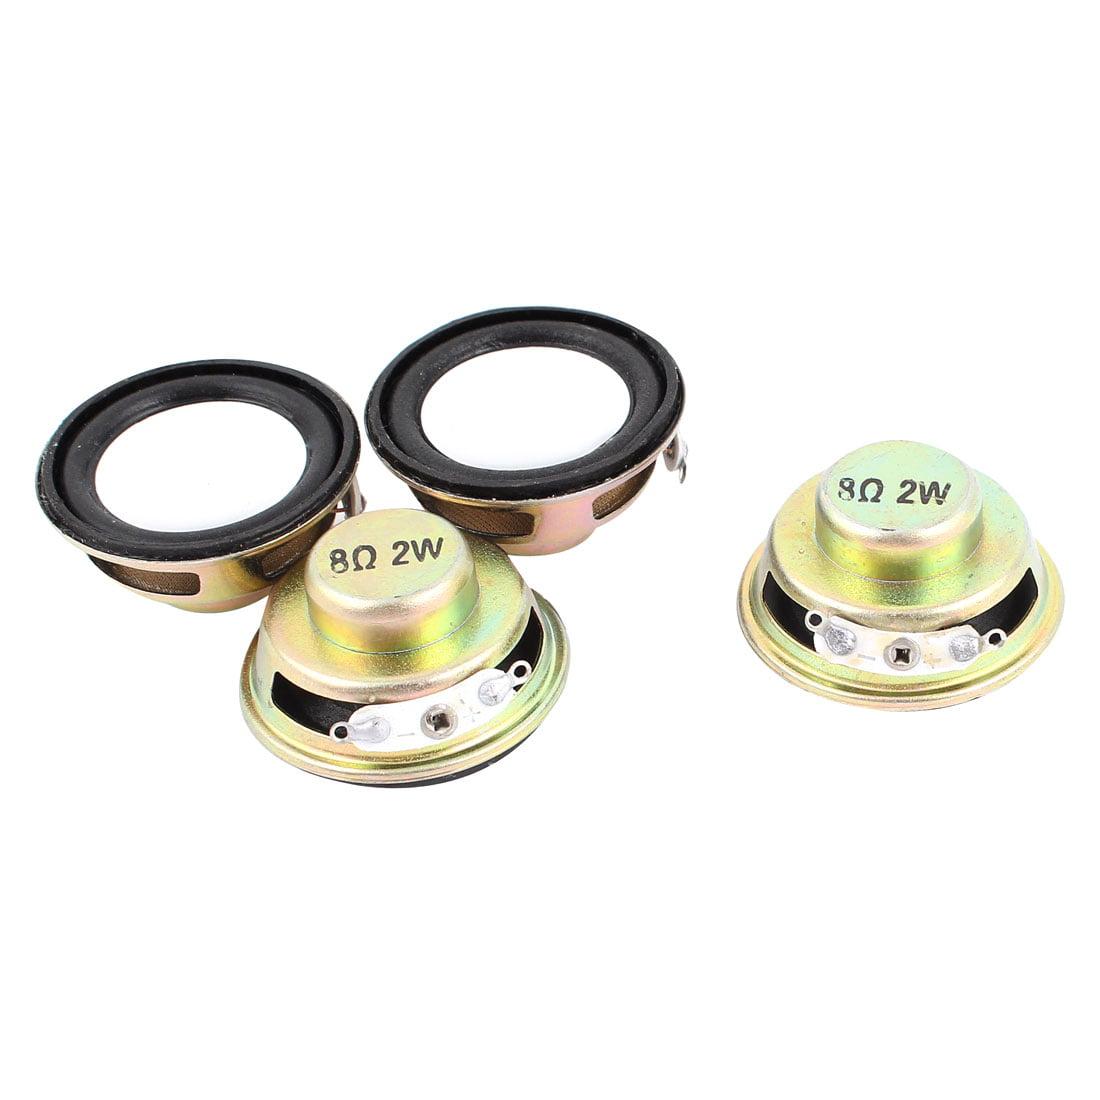 4pcs 8Ohm 2W 36mm Diameter Round Metal Shell Audio Speaker Horn - image 2 of 2